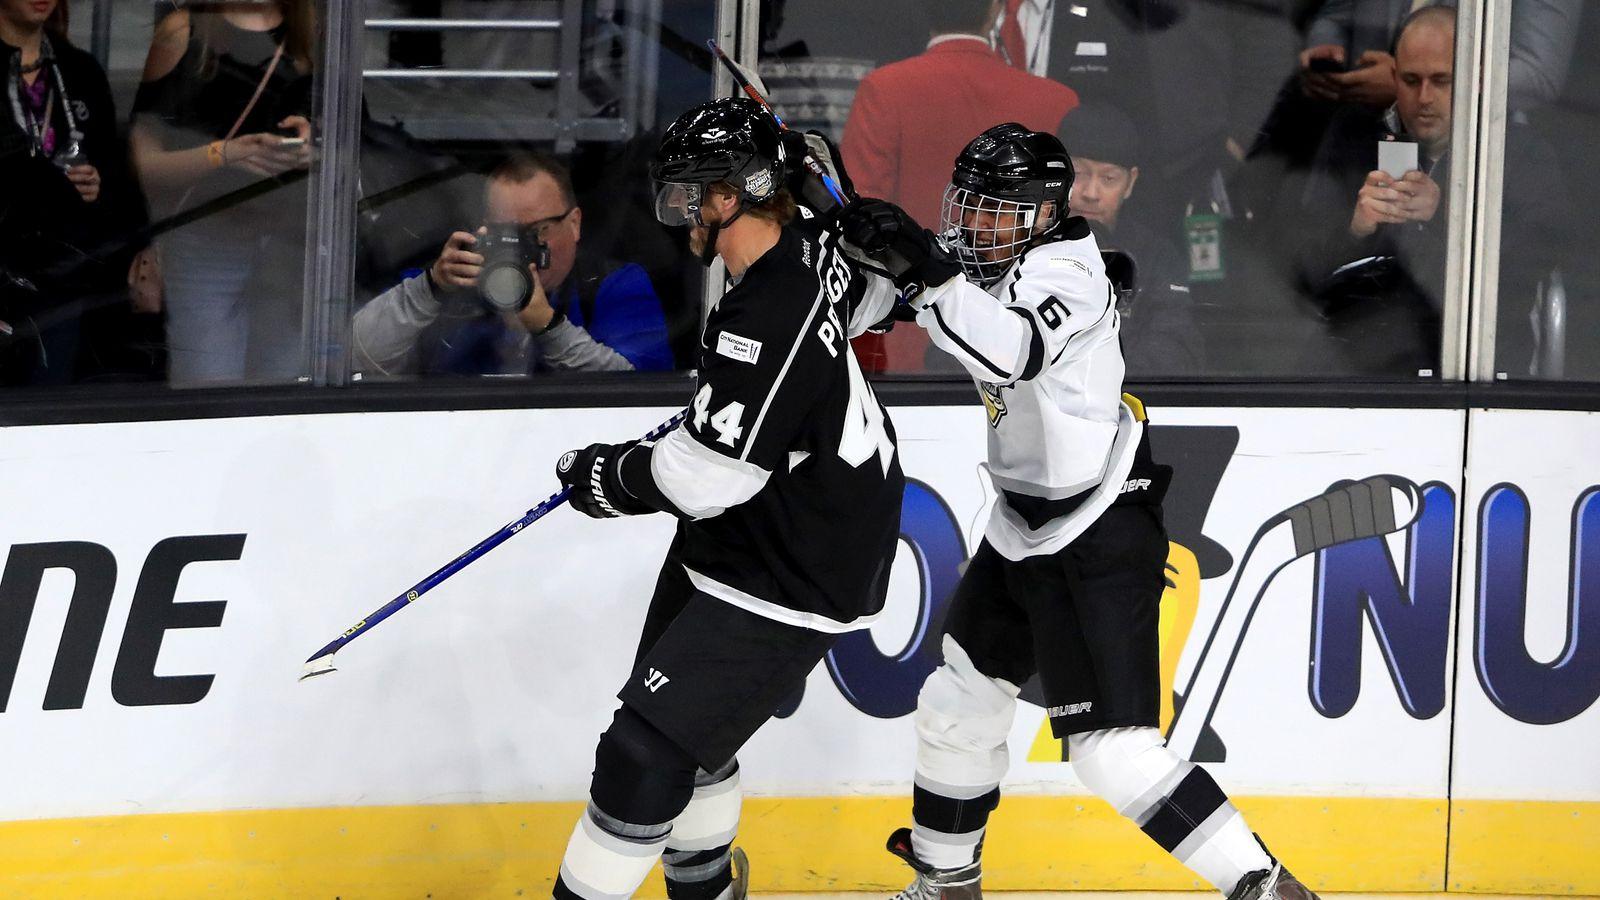 Chris Prongers与Justin Bieber的战争是2017年NHL全明星周末的最佳时刻